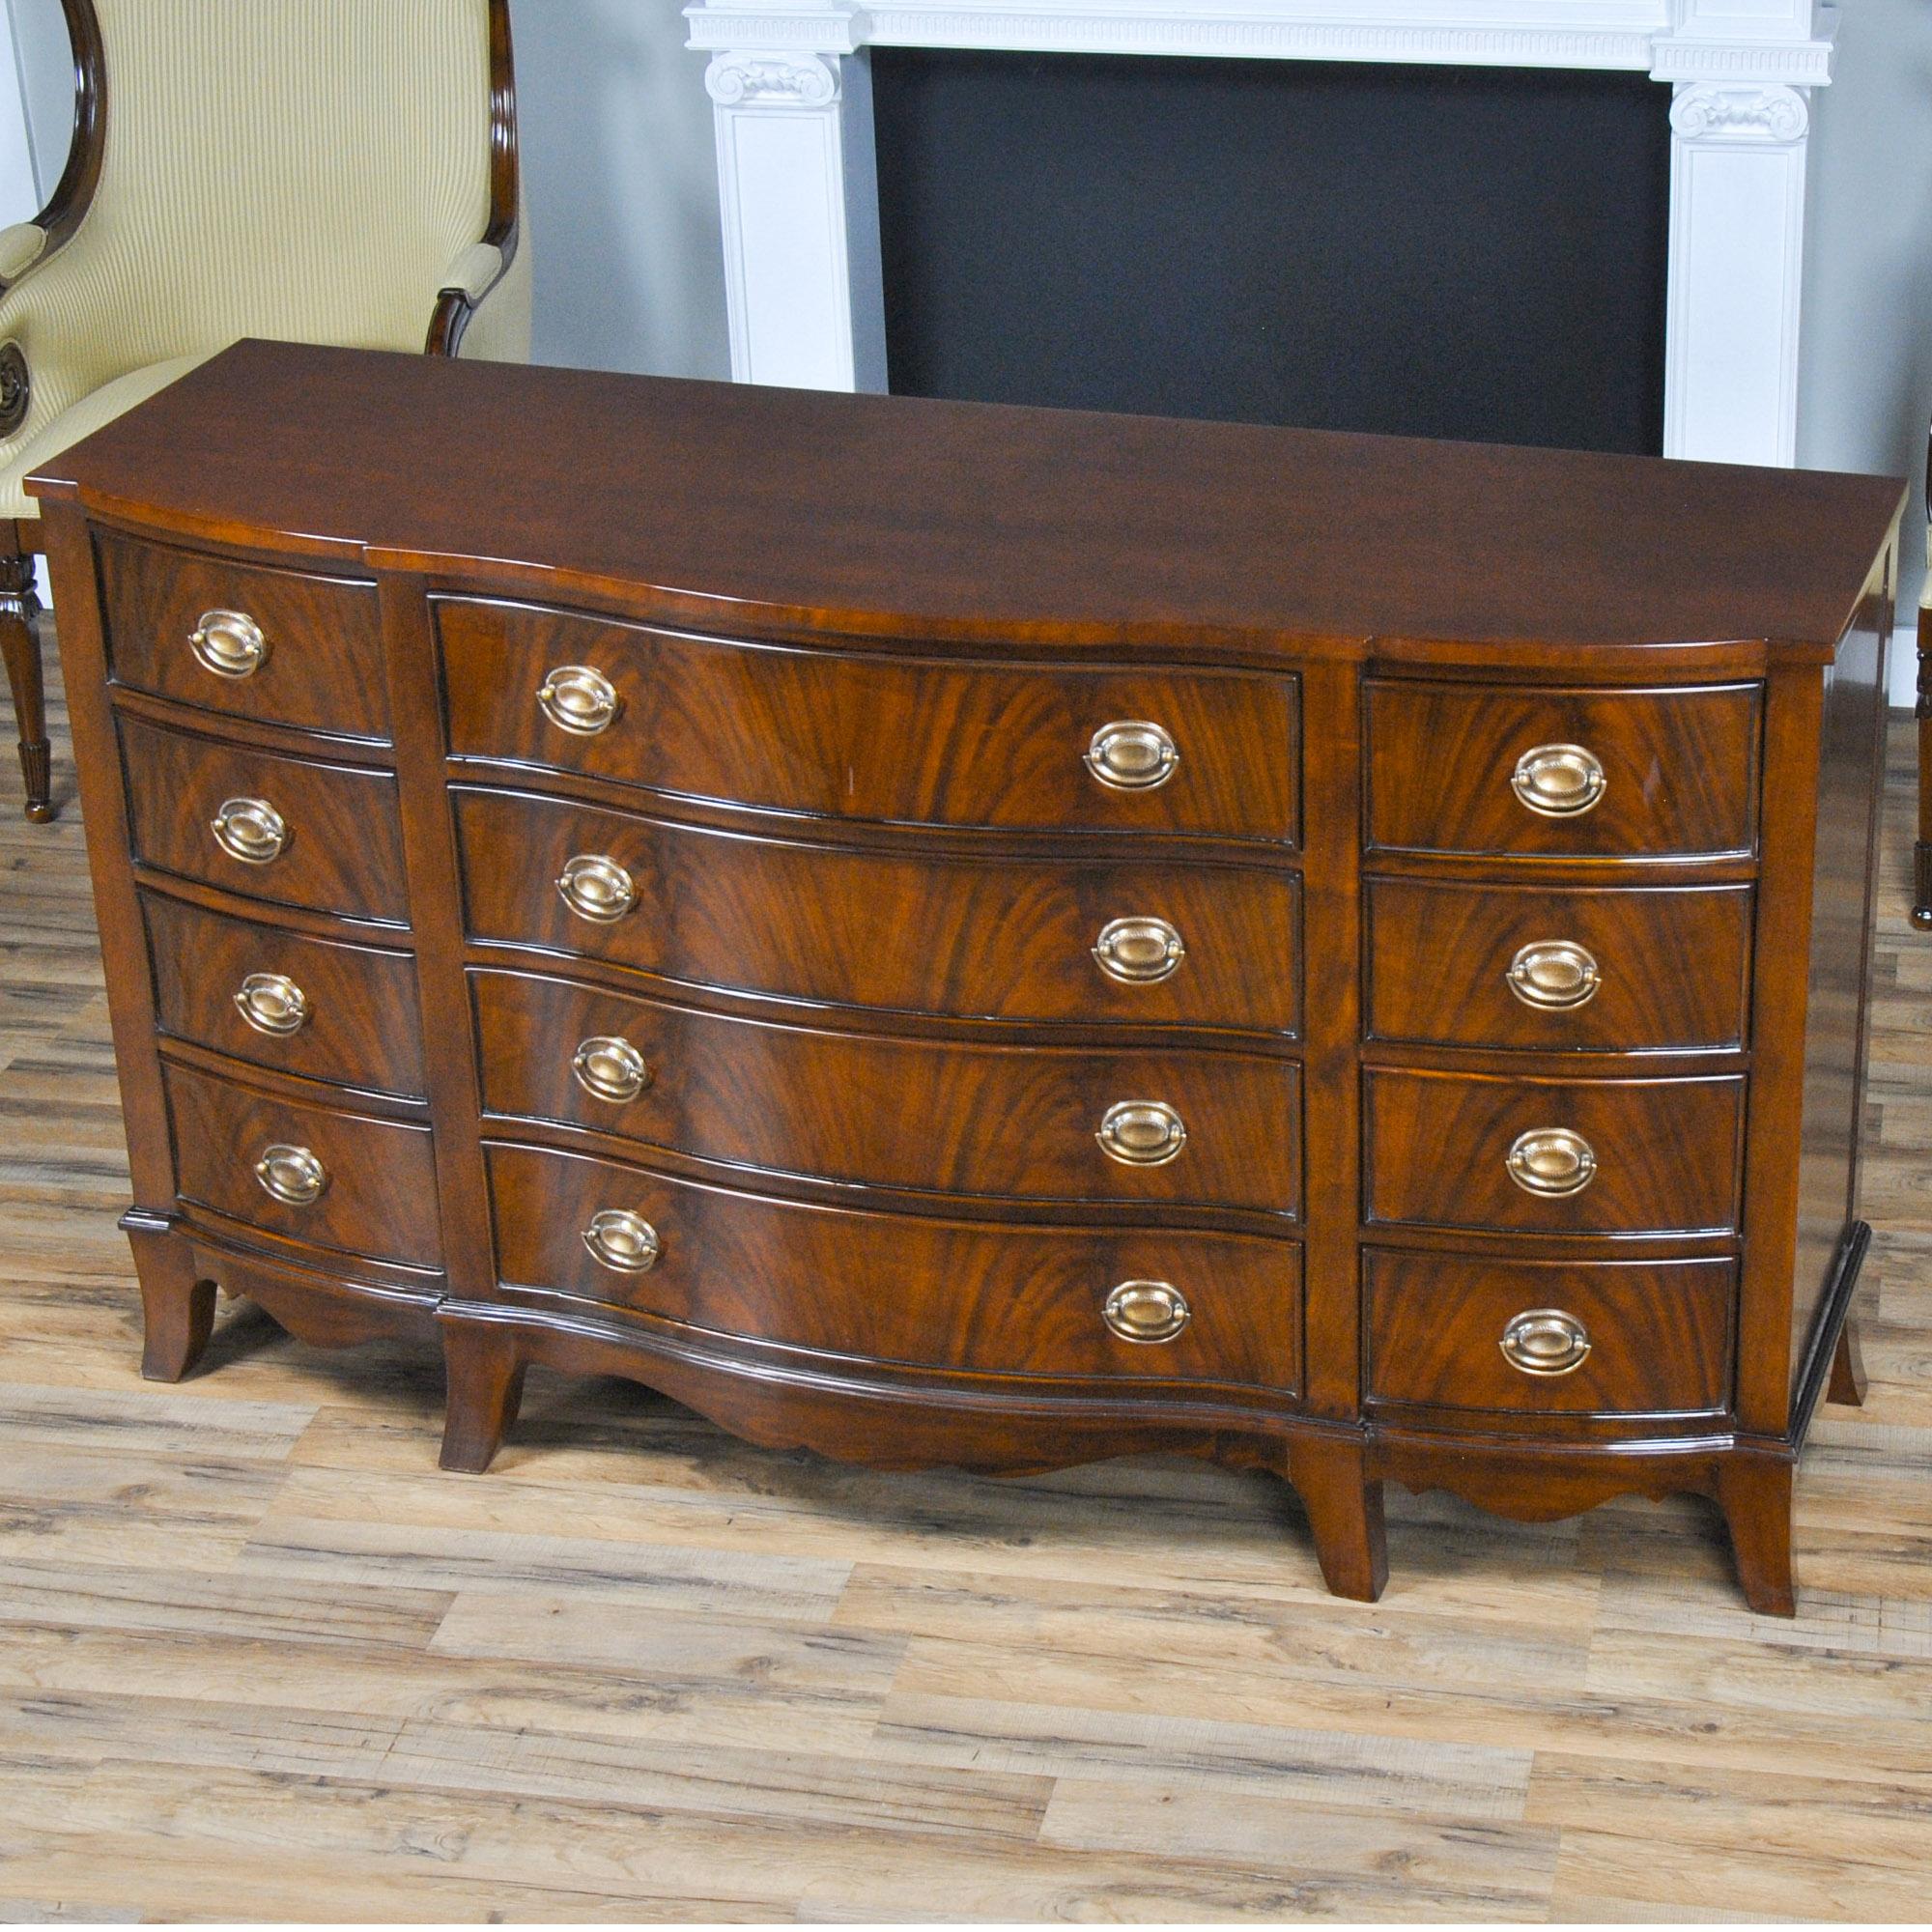 Mahogany Triple Dresser, Niagara Furniture, Mahogany Bedroom